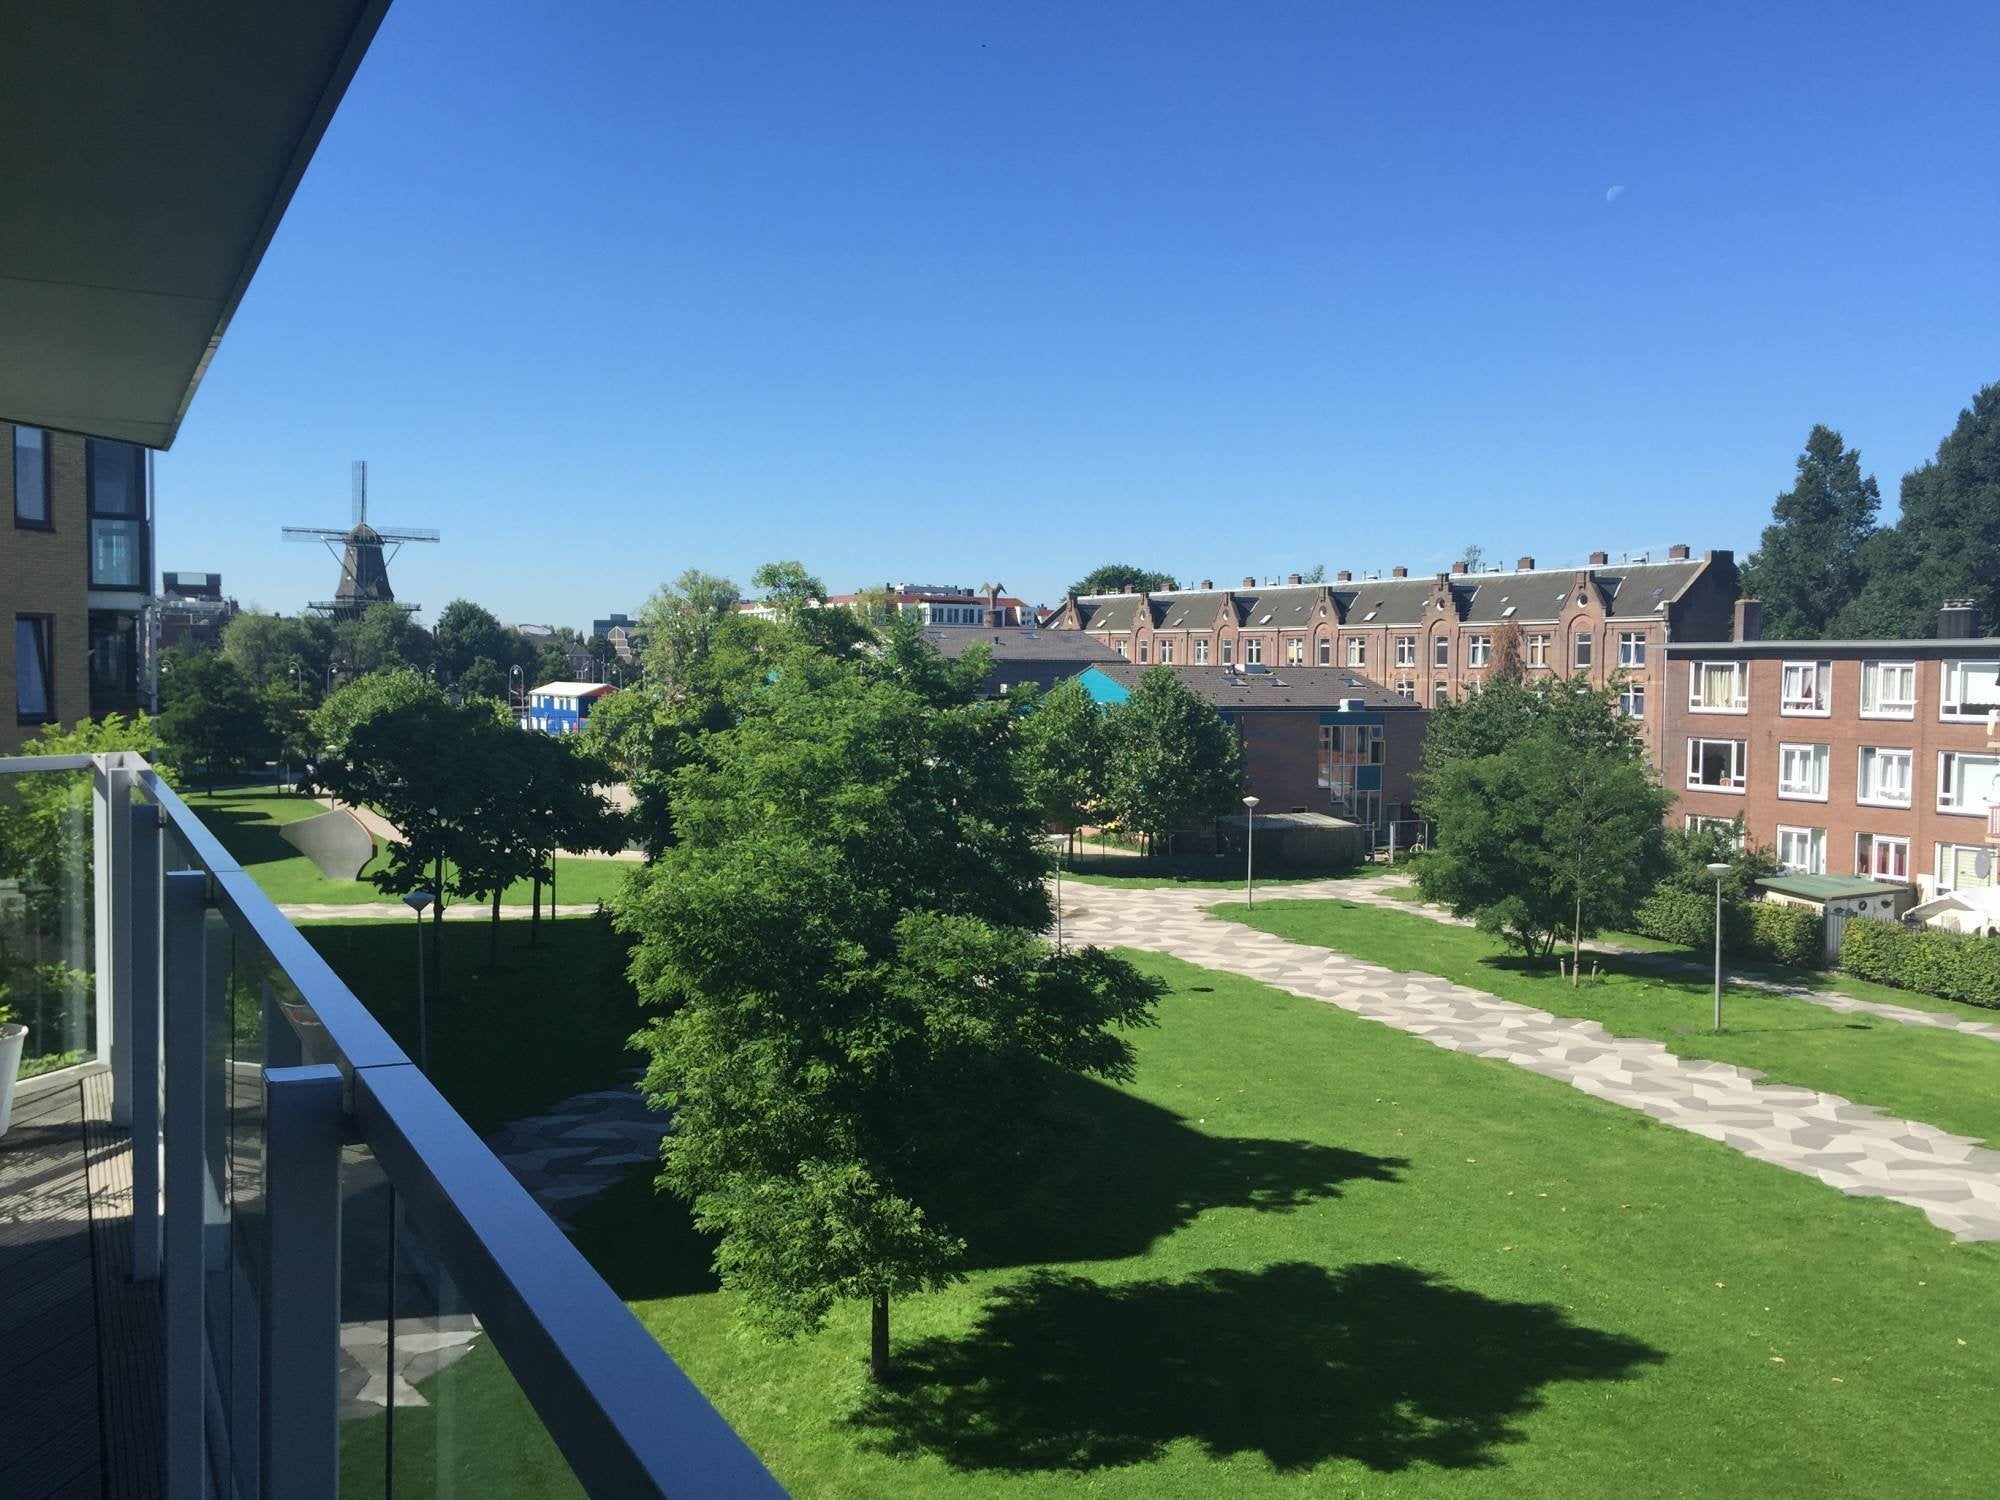 Funenpark, Amsterdam